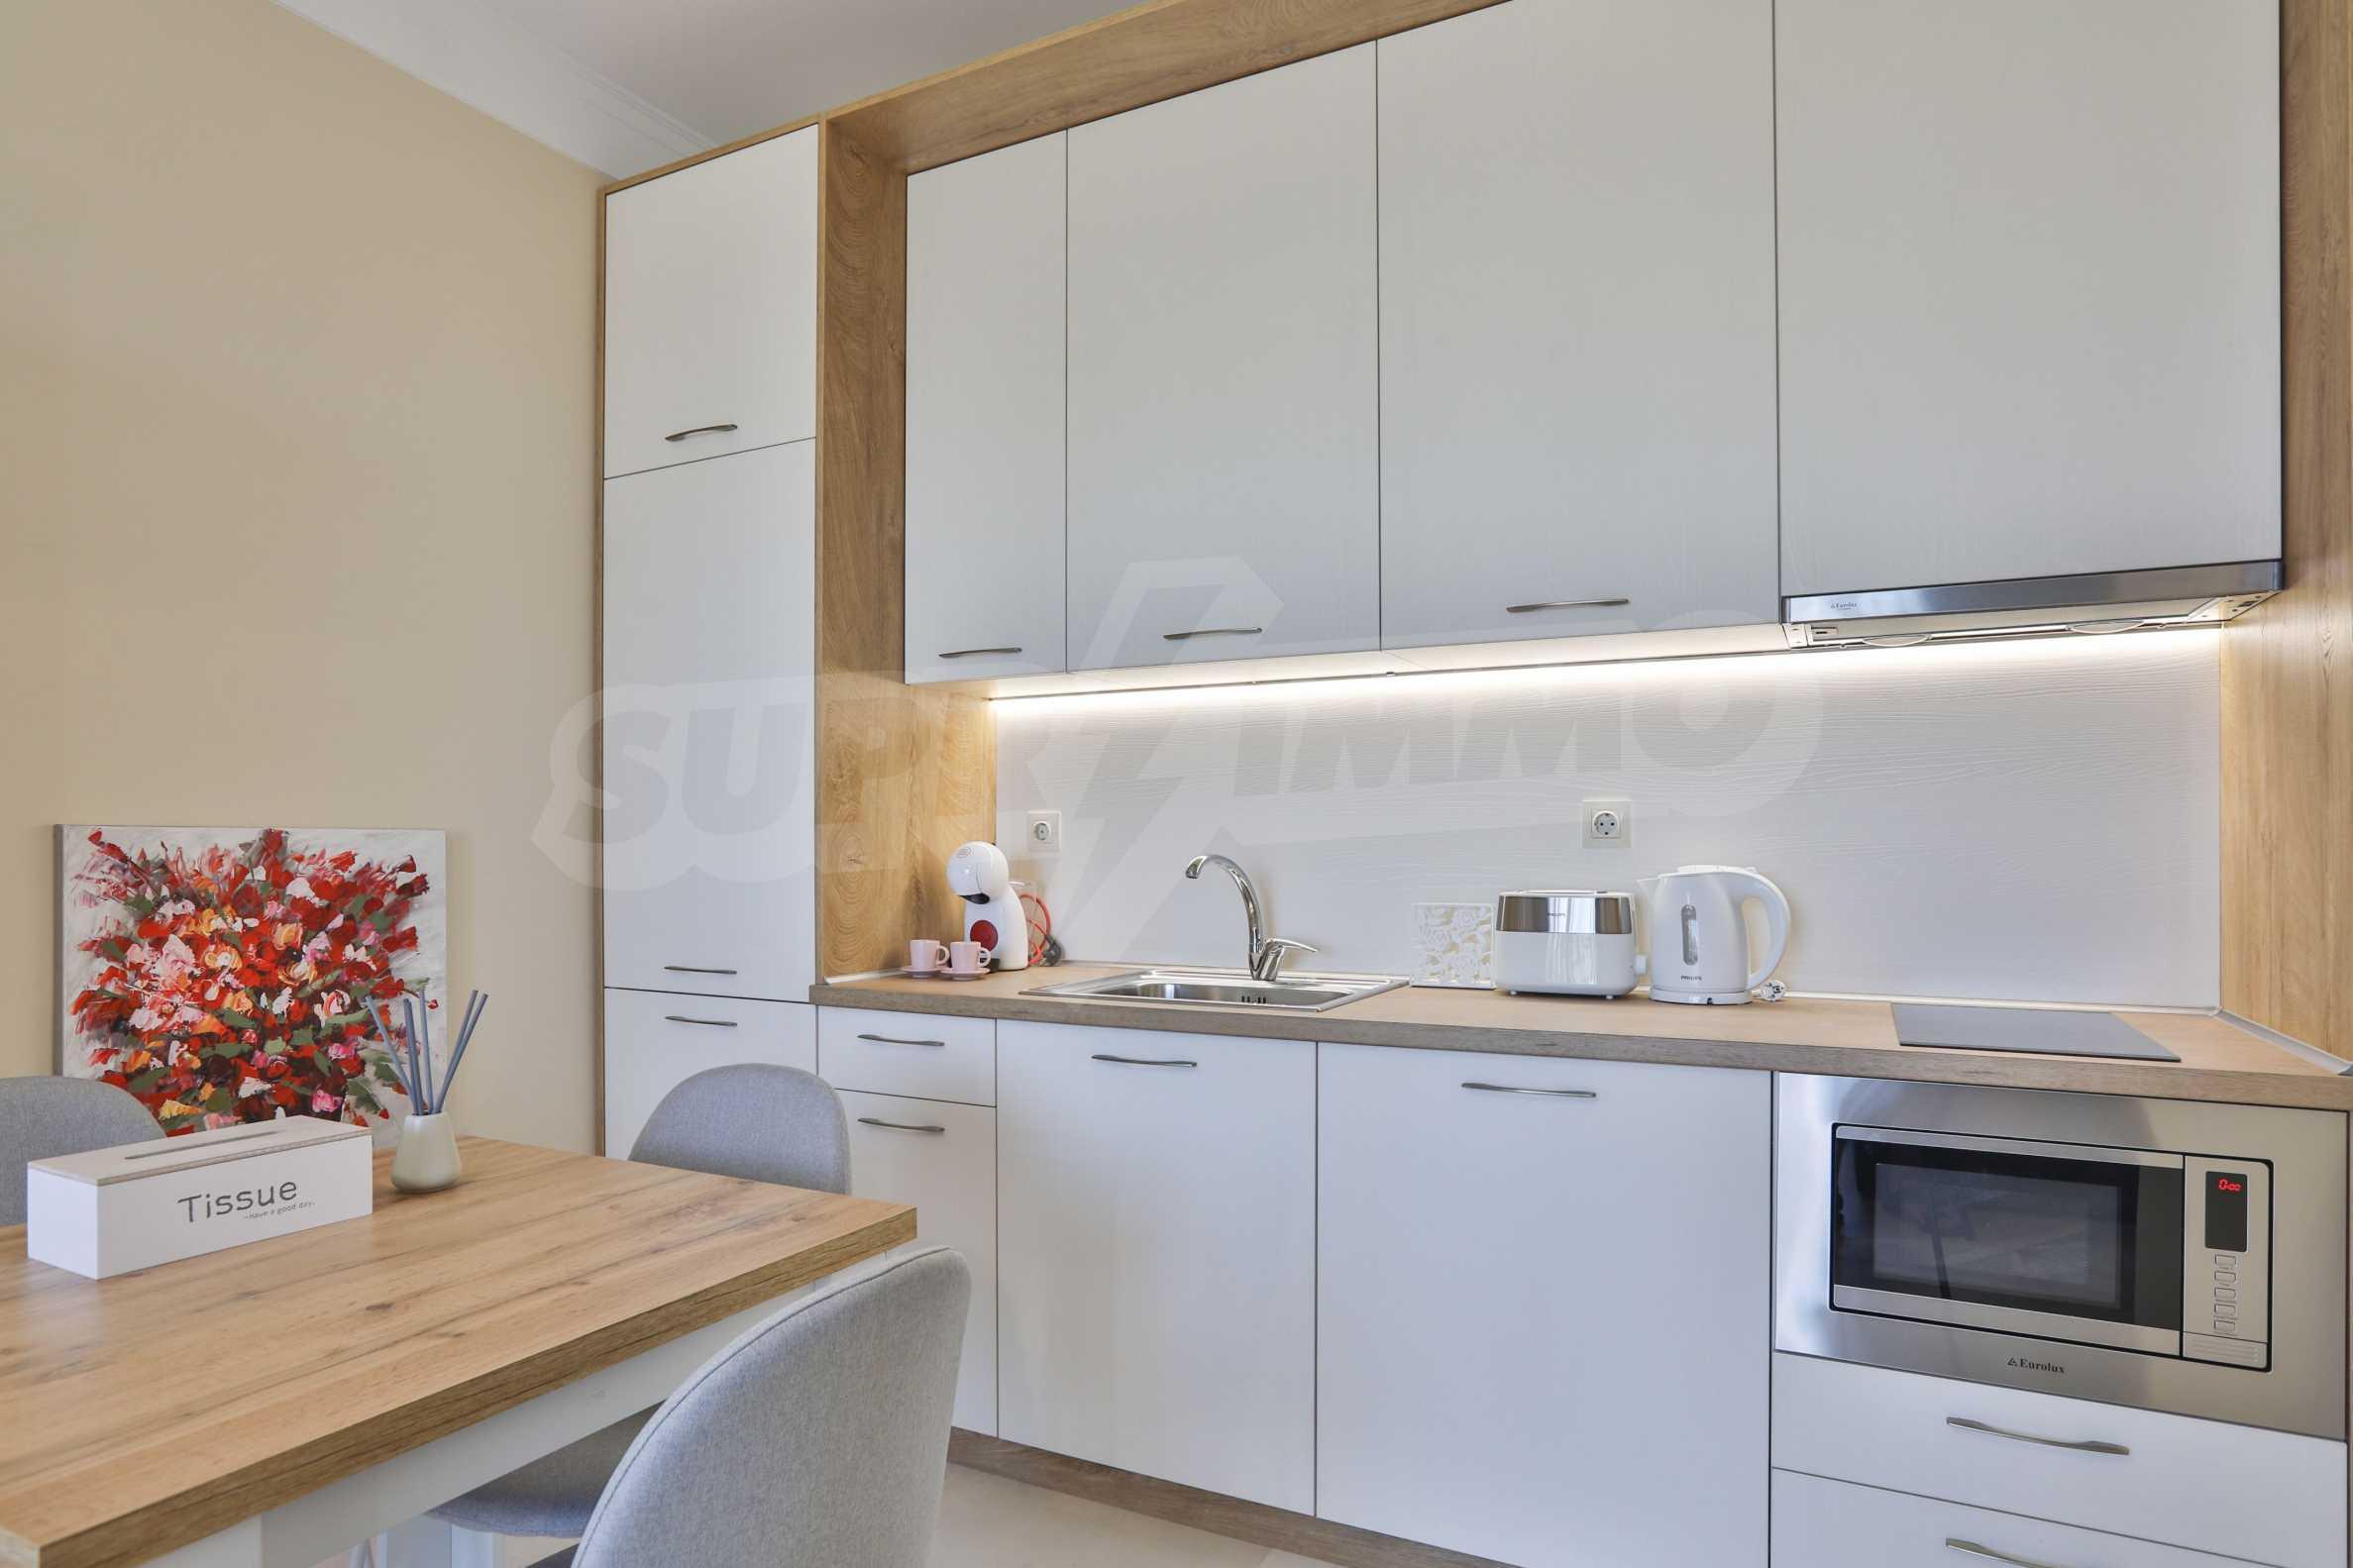 Първокласен двустаен апартамент в Belle Époque Beach Residence (ап. №A 206) 2